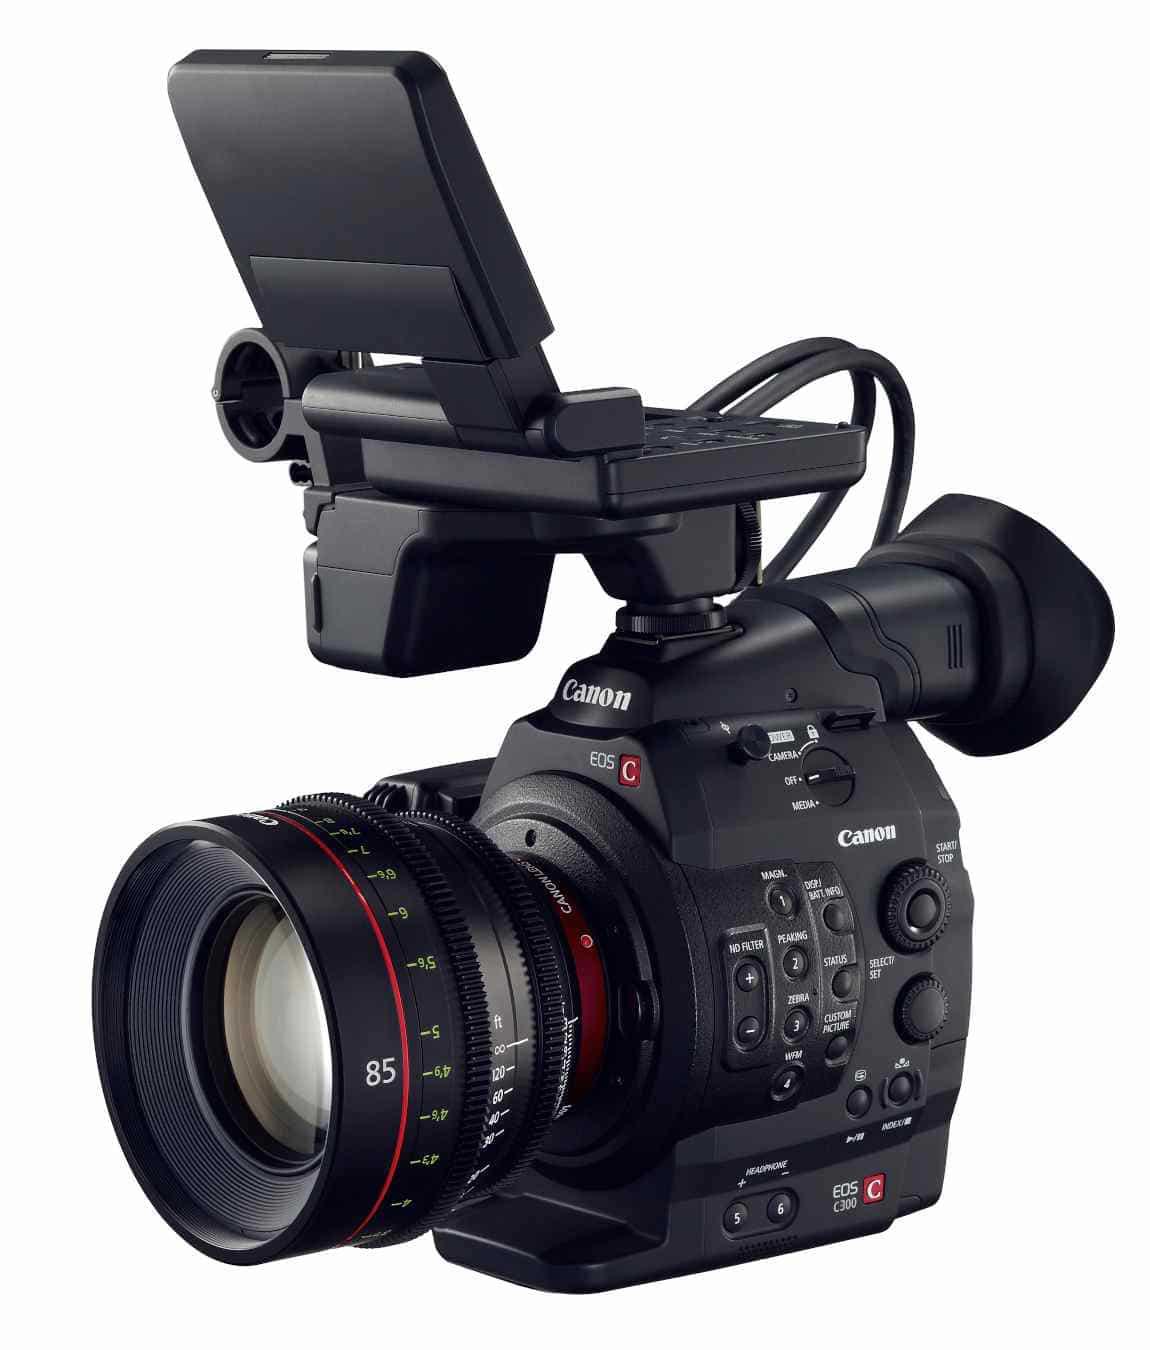 EOS C300 MARK II DIGITAL CINEMA CAMERA - Canon Global